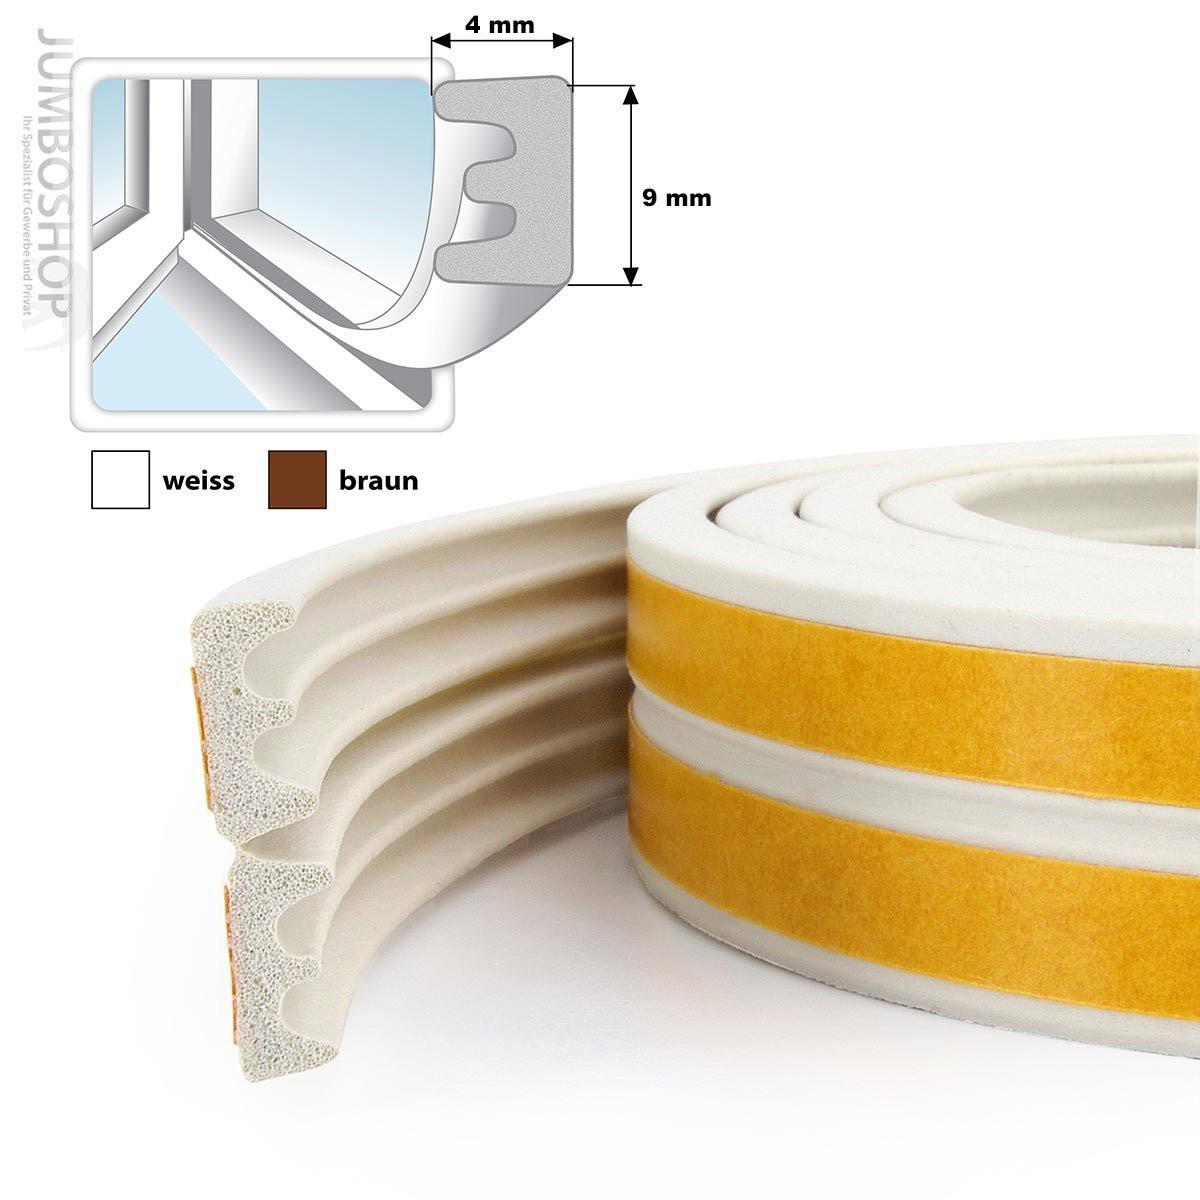 fensterdichtung gummidichtung e profil fenster dichtung selbtsklebend fensterdichtung braun. Black Bedroom Furniture Sets. Home Design Ideas